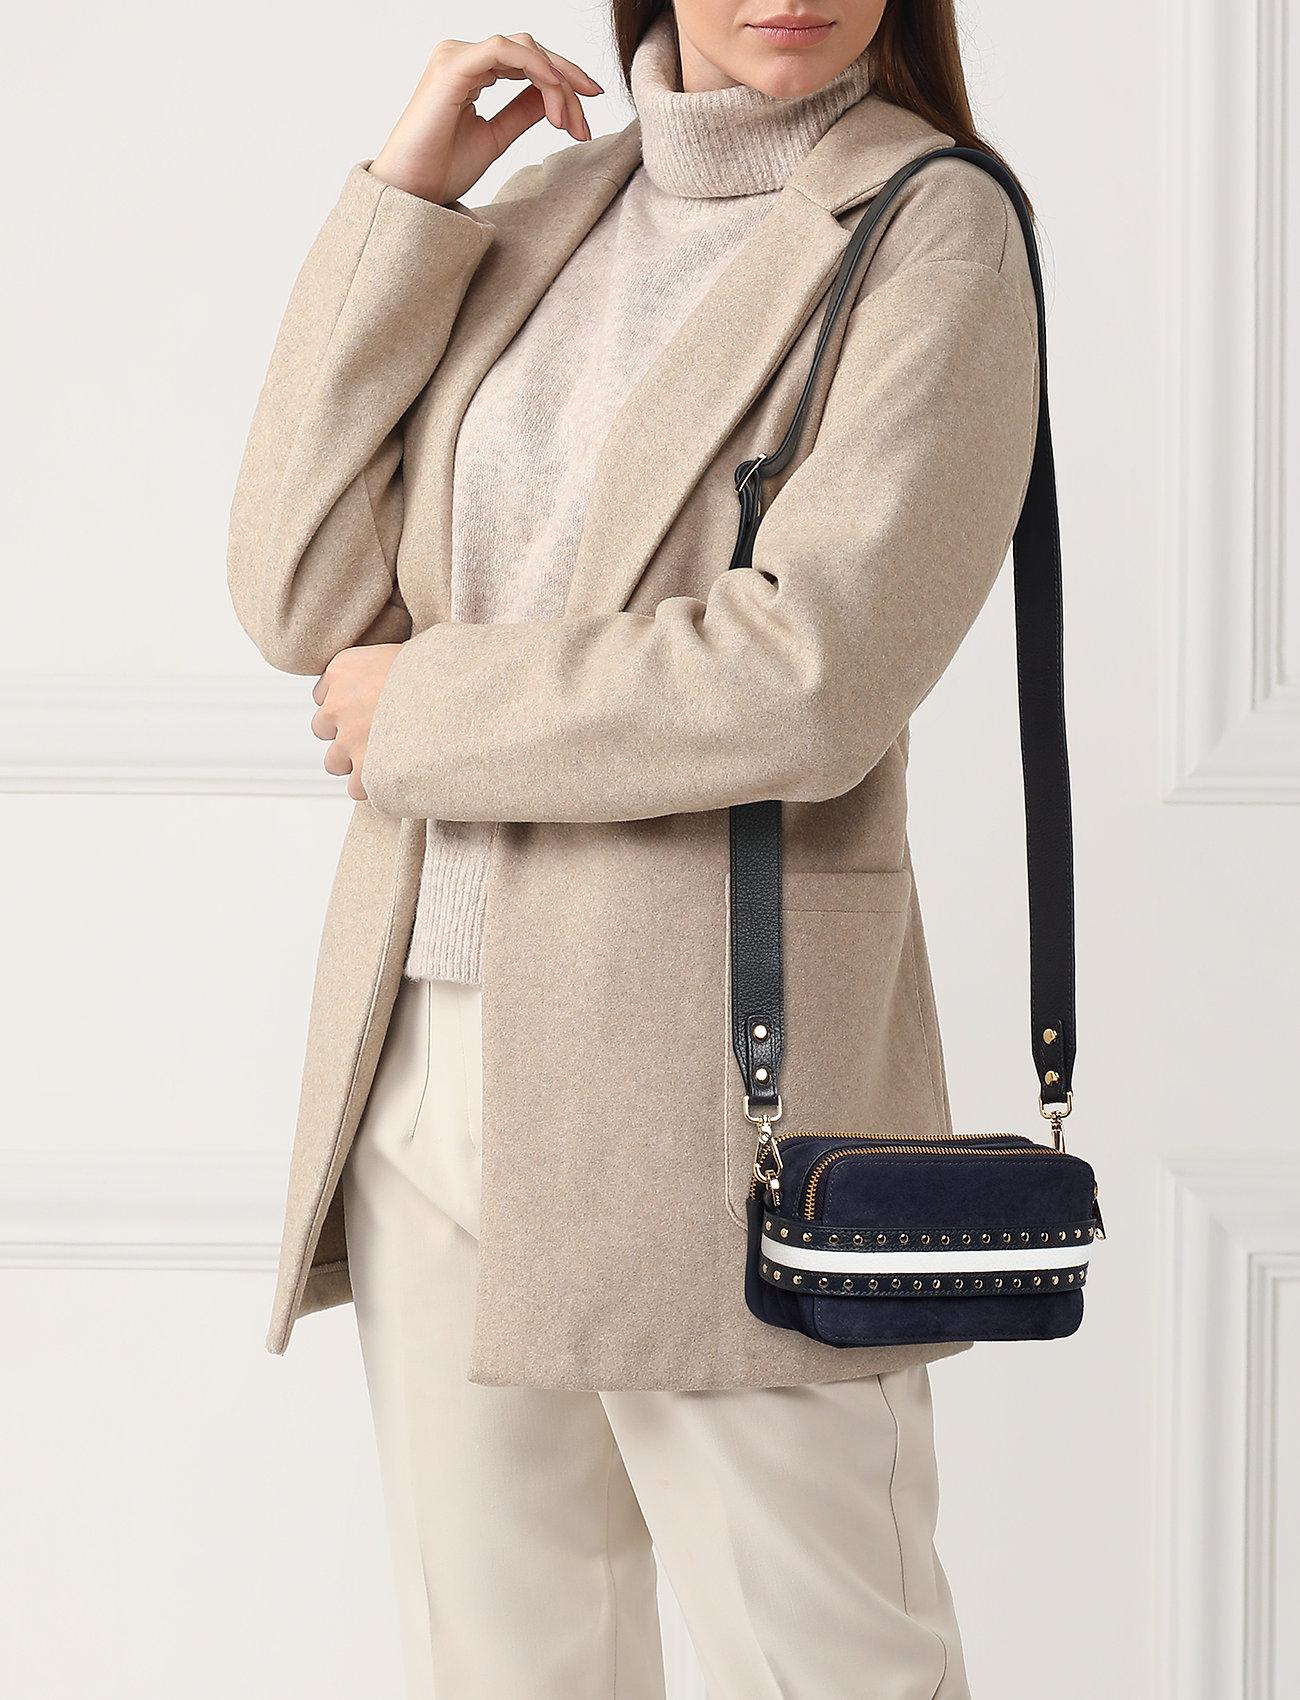 Adax Berlin Shoulder Bag Catherine - Axelremsväskor Navy